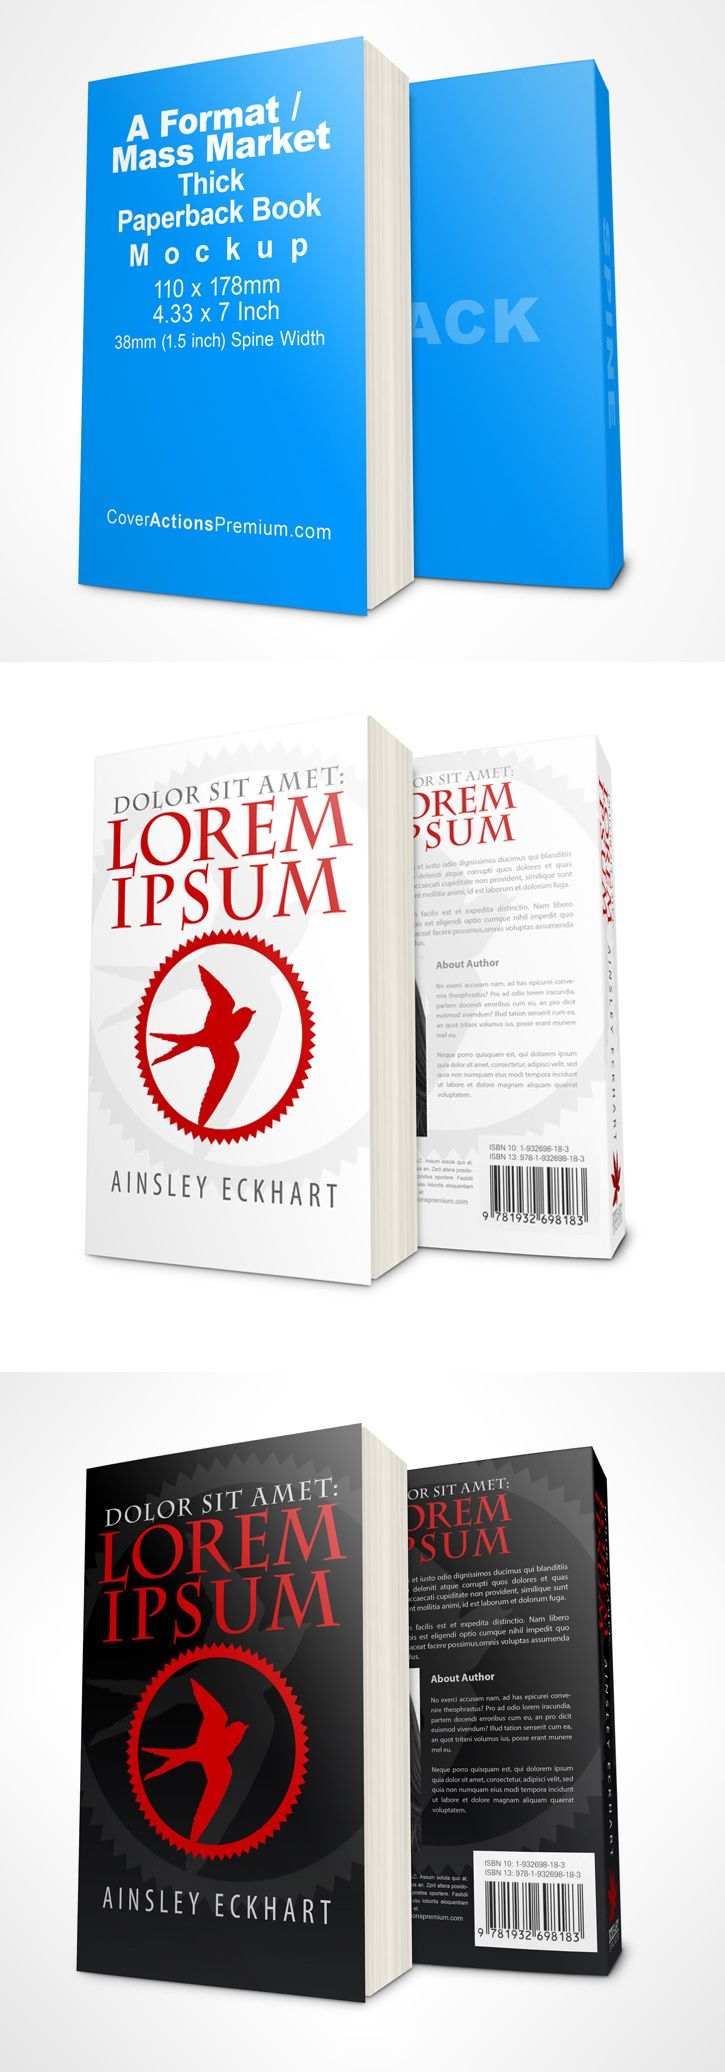 Thick book mockup -mass market paperback